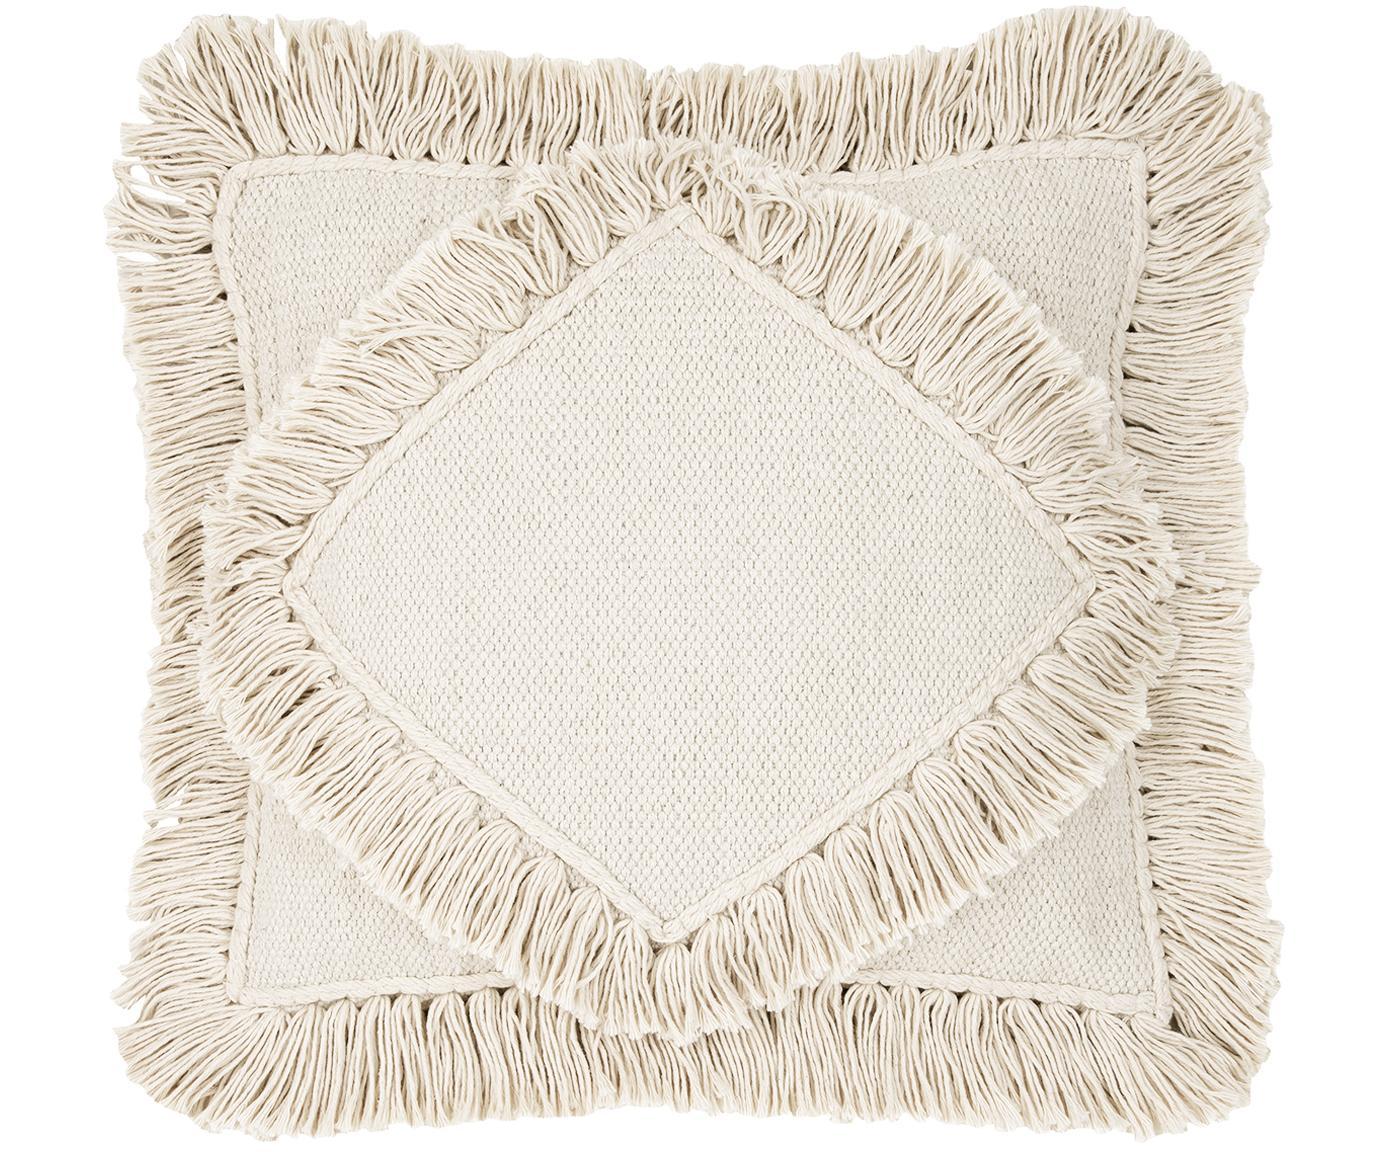 Kissenhülle Kaheka, 100% Baumwolle, Ecru, 45 x 45 cm